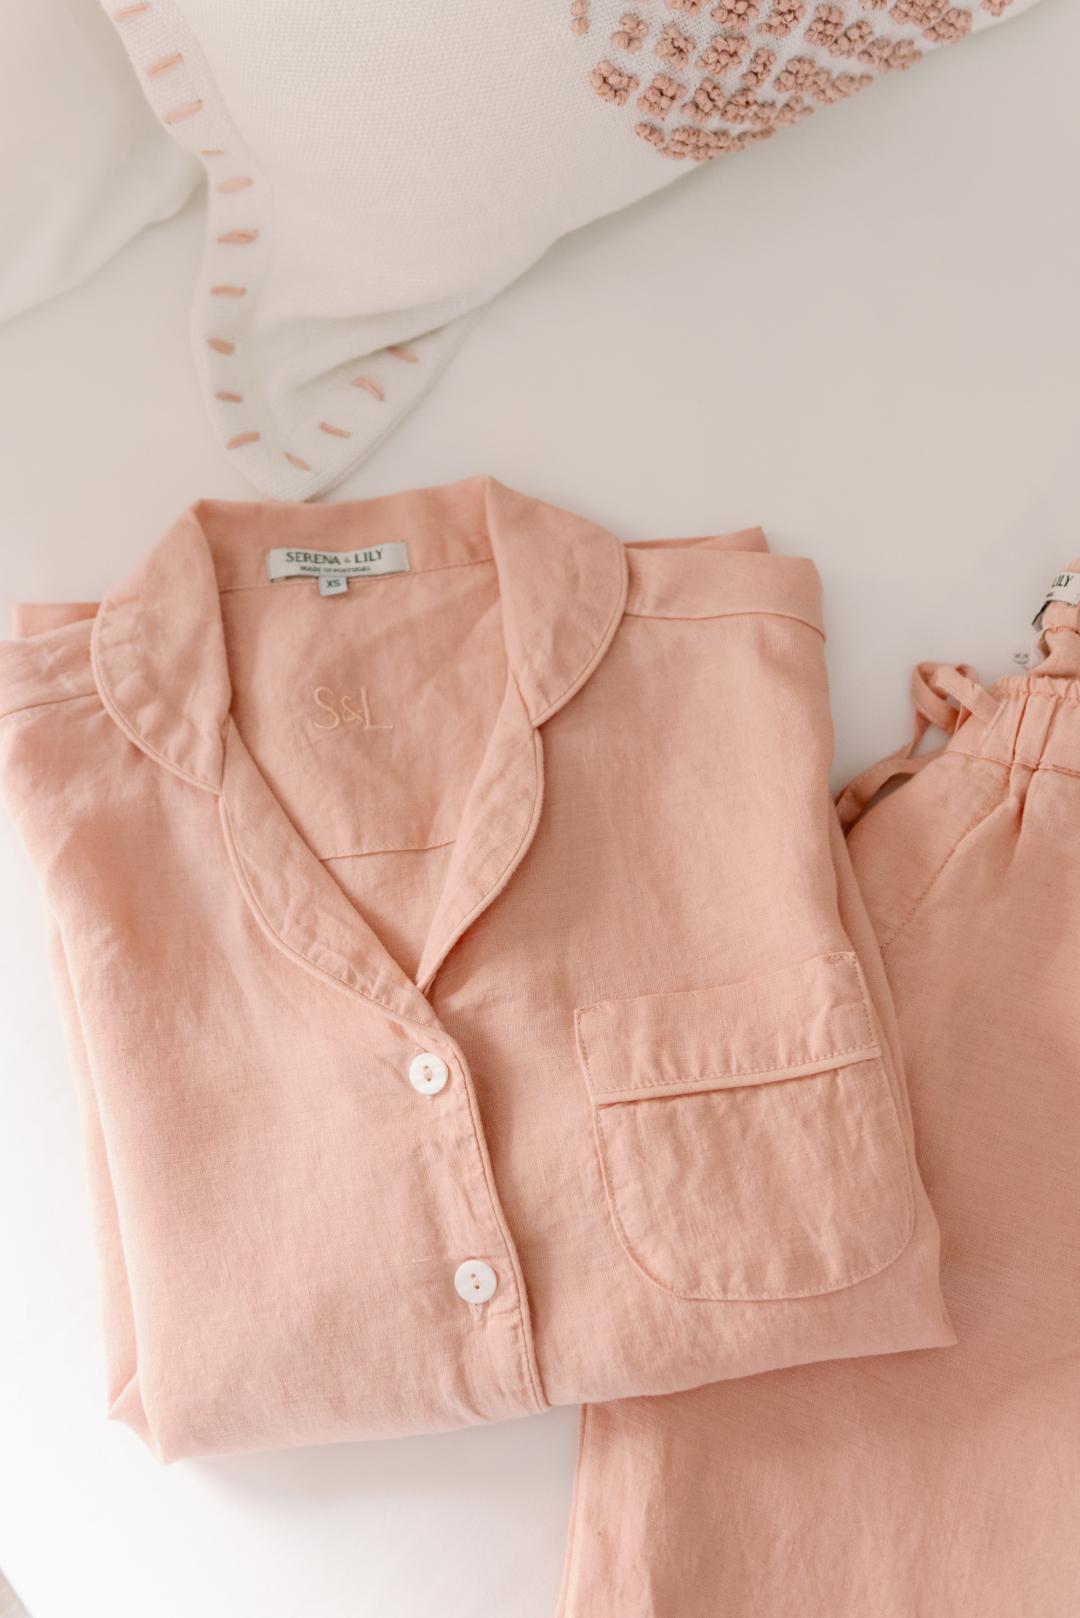 Serena & Lily Positano Linen Pajamas in Wild Rose